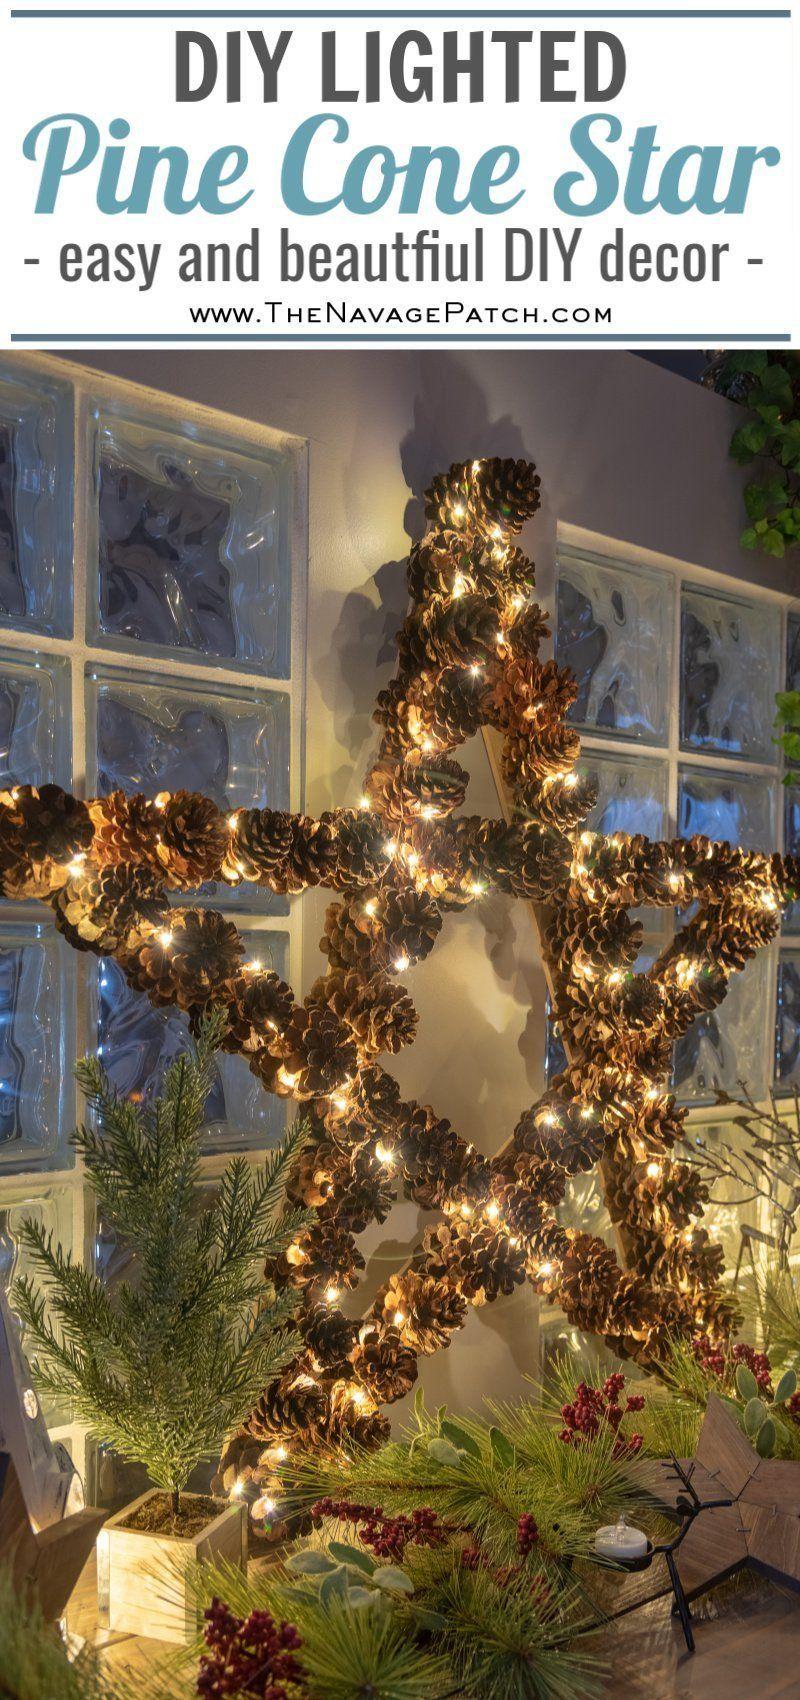 DIY Lighted Pine Cone Star in 2020 Diy christmas star